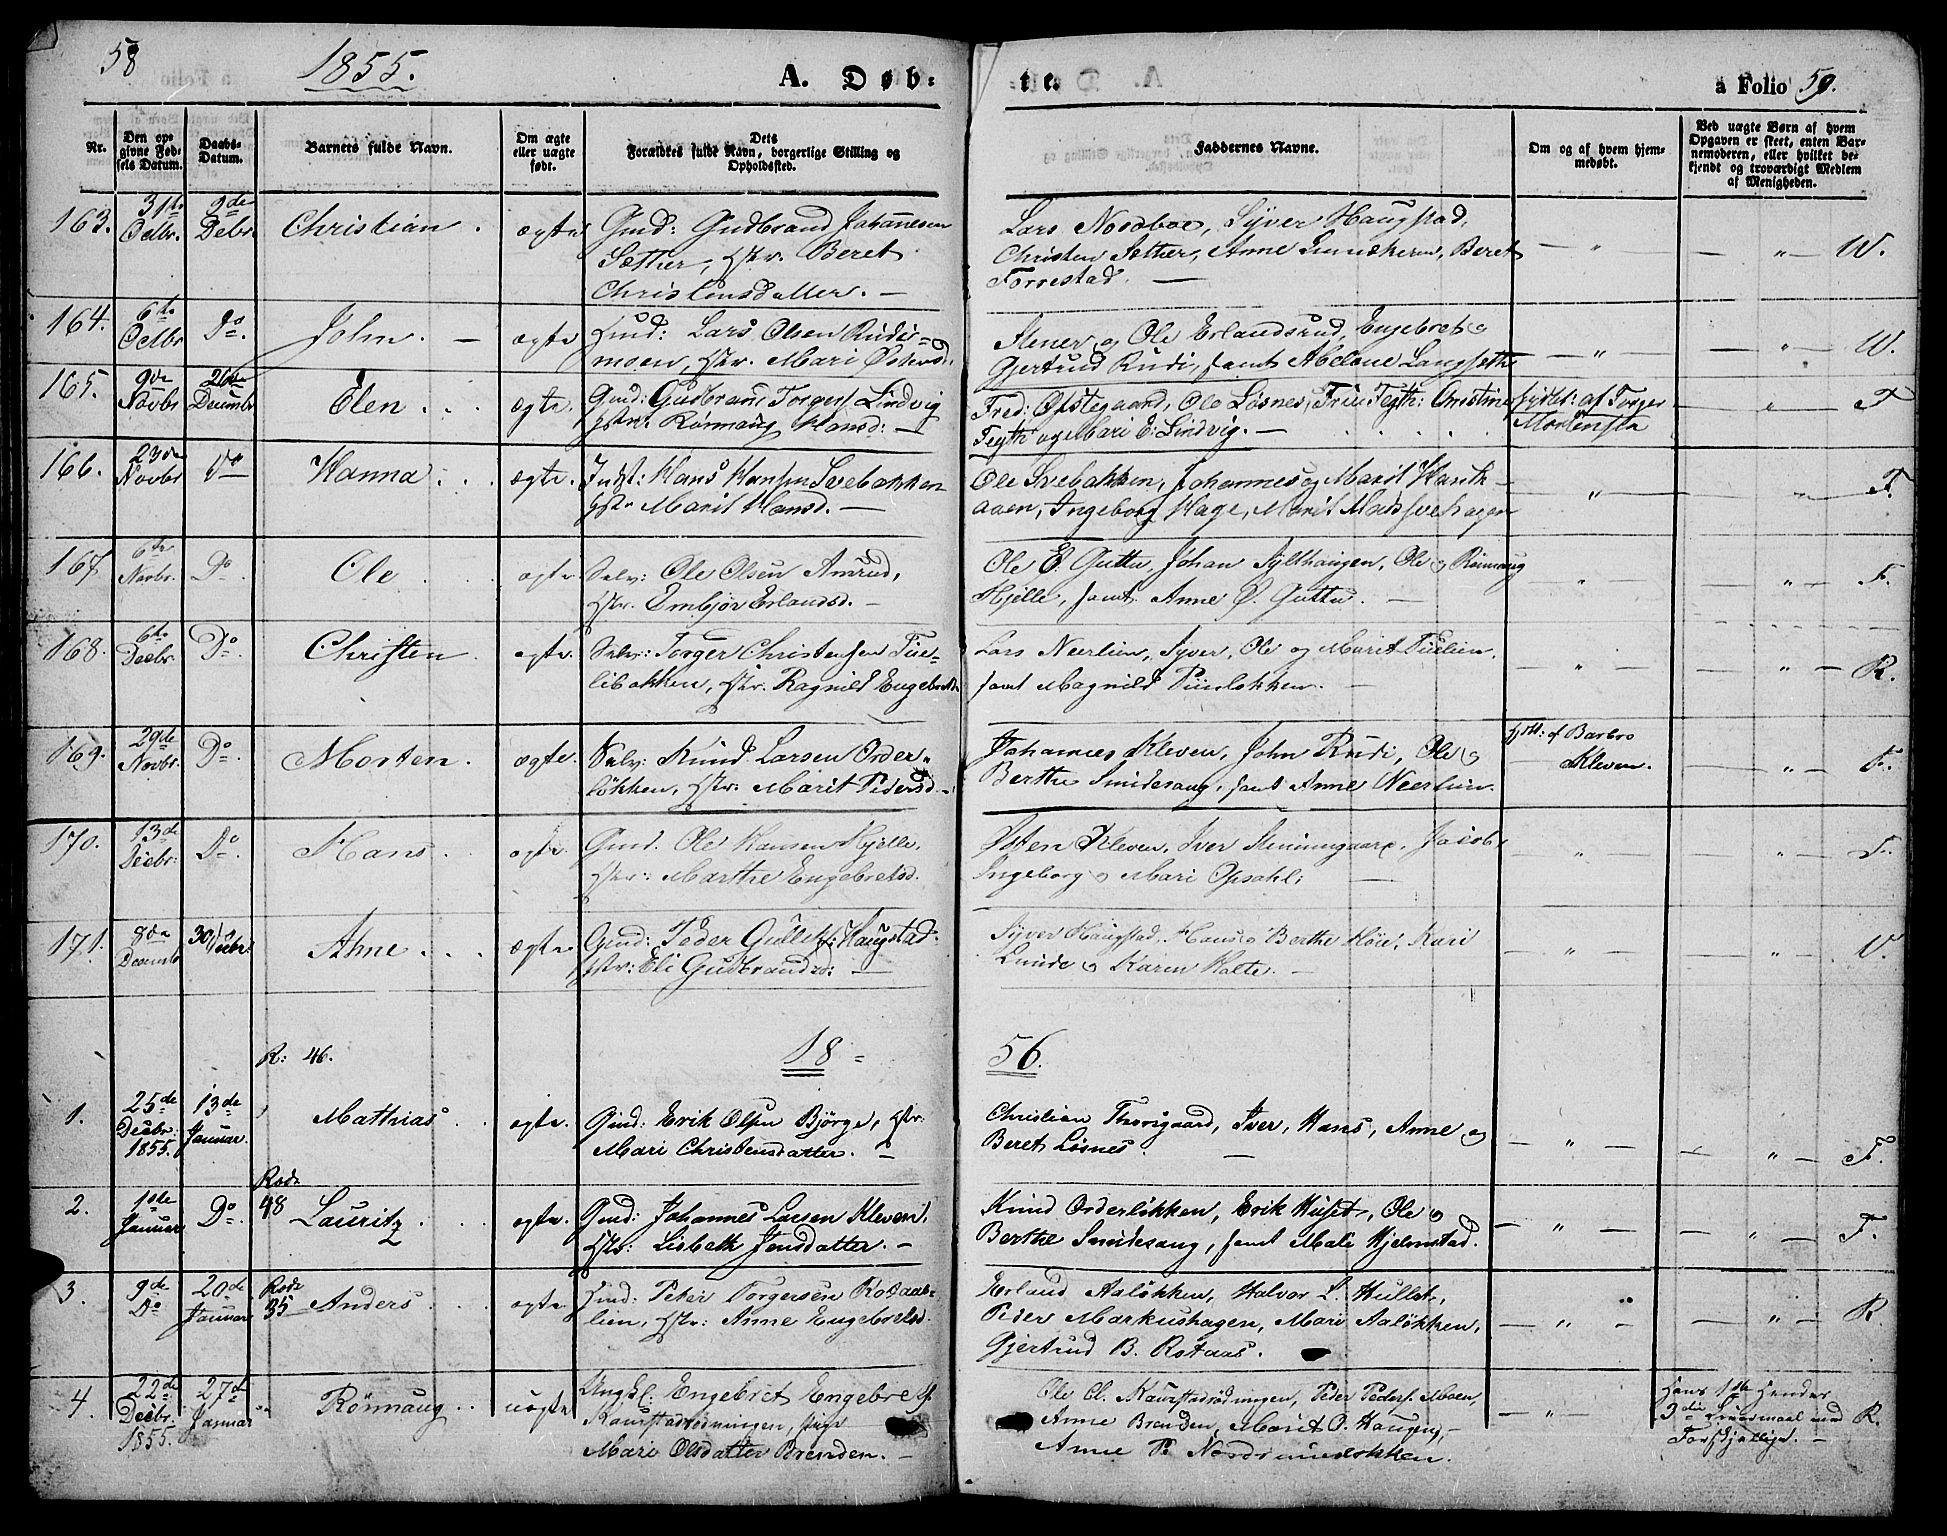 SAH, Ringebu prestekontor, Klokkerbok nr. 3, 1854-1866, s. 58-59